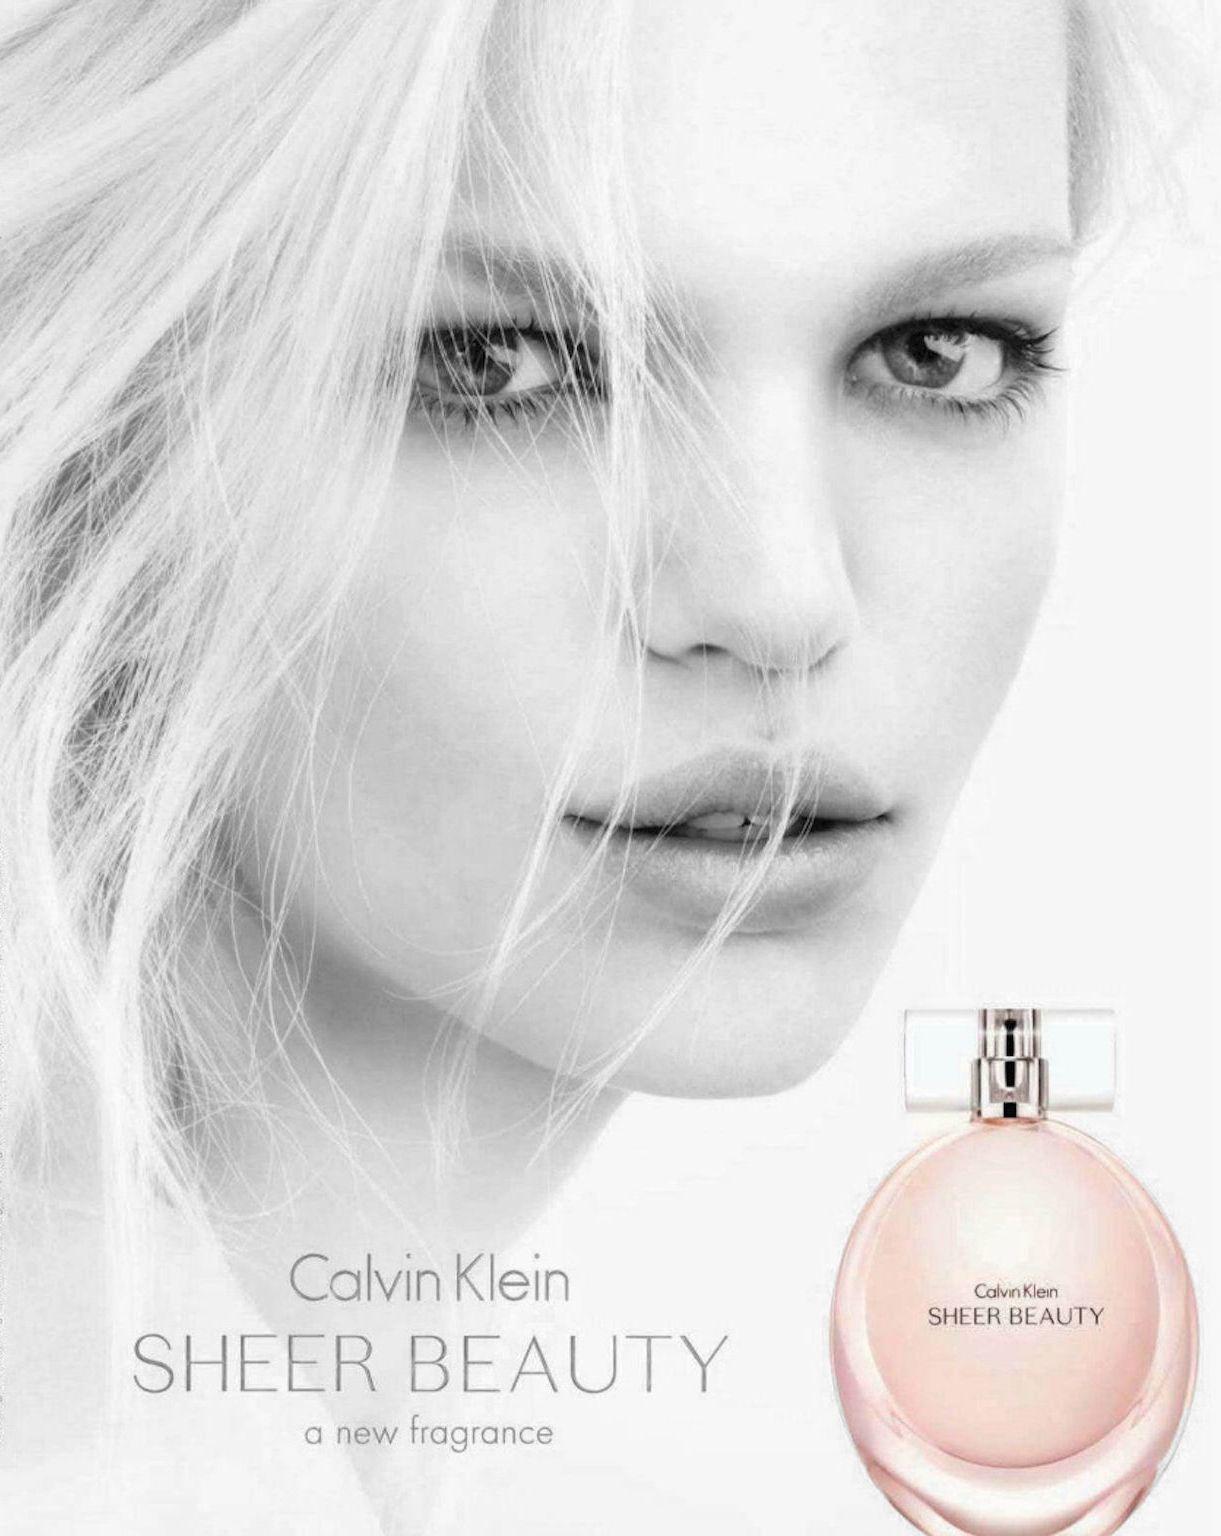 The Beauty Model Calvin Klein Sheer Beauty Sheer Beauty Ck Sheer Beauty